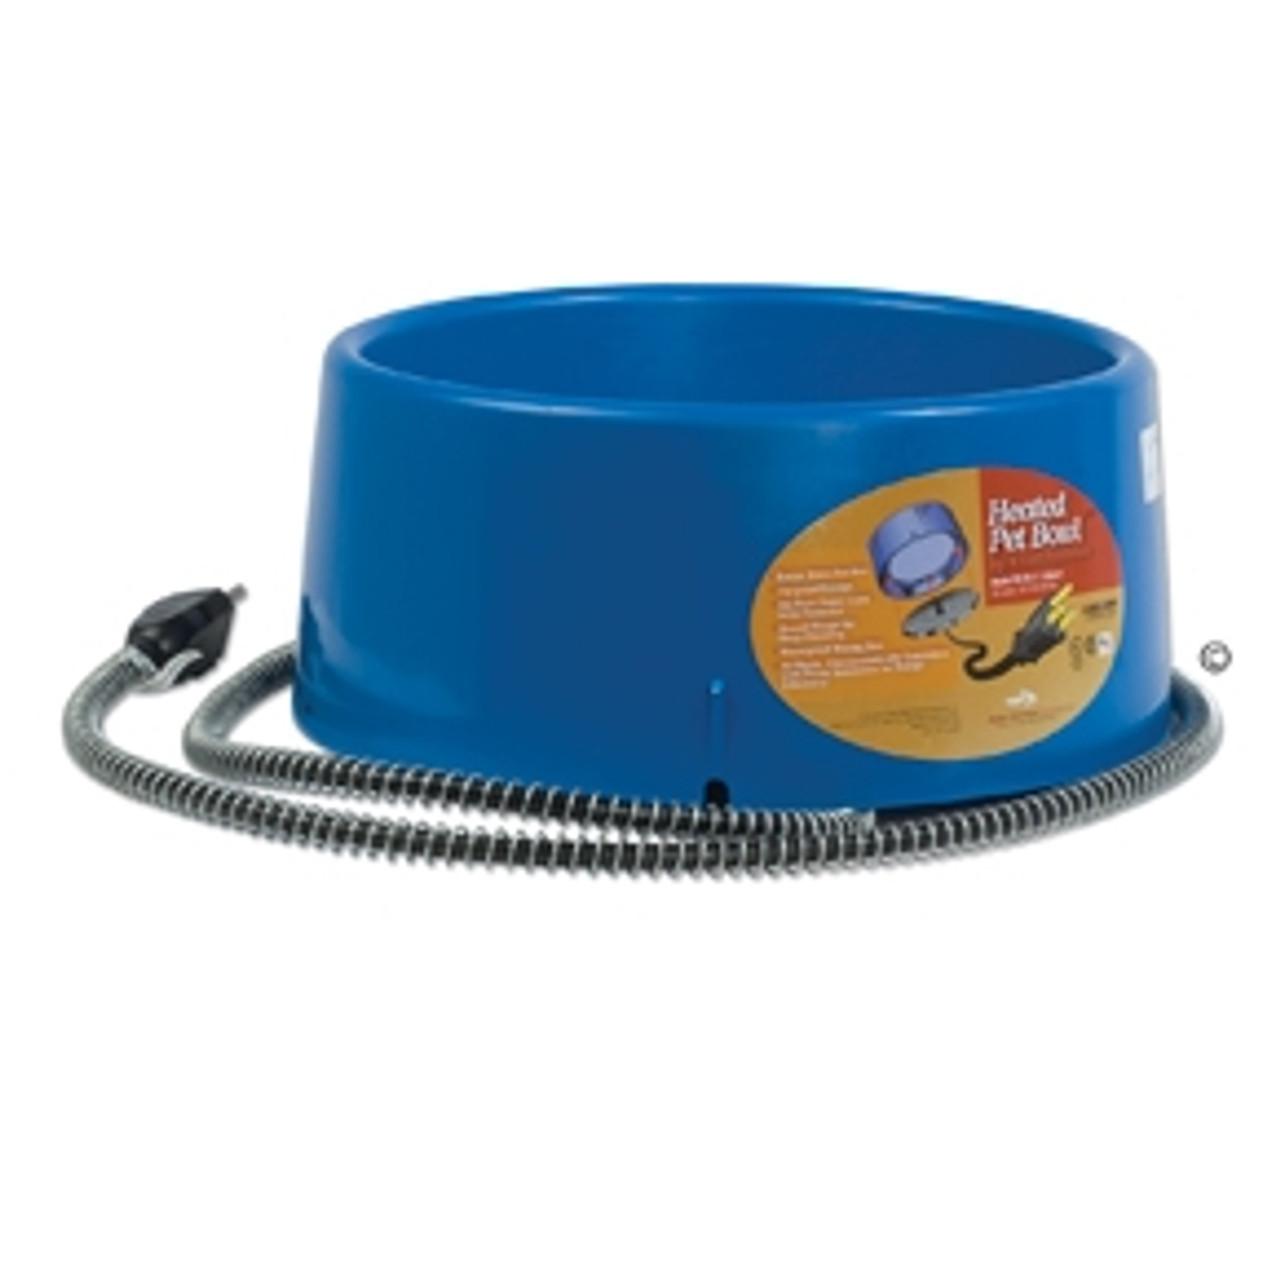 Heated Pet Bowl